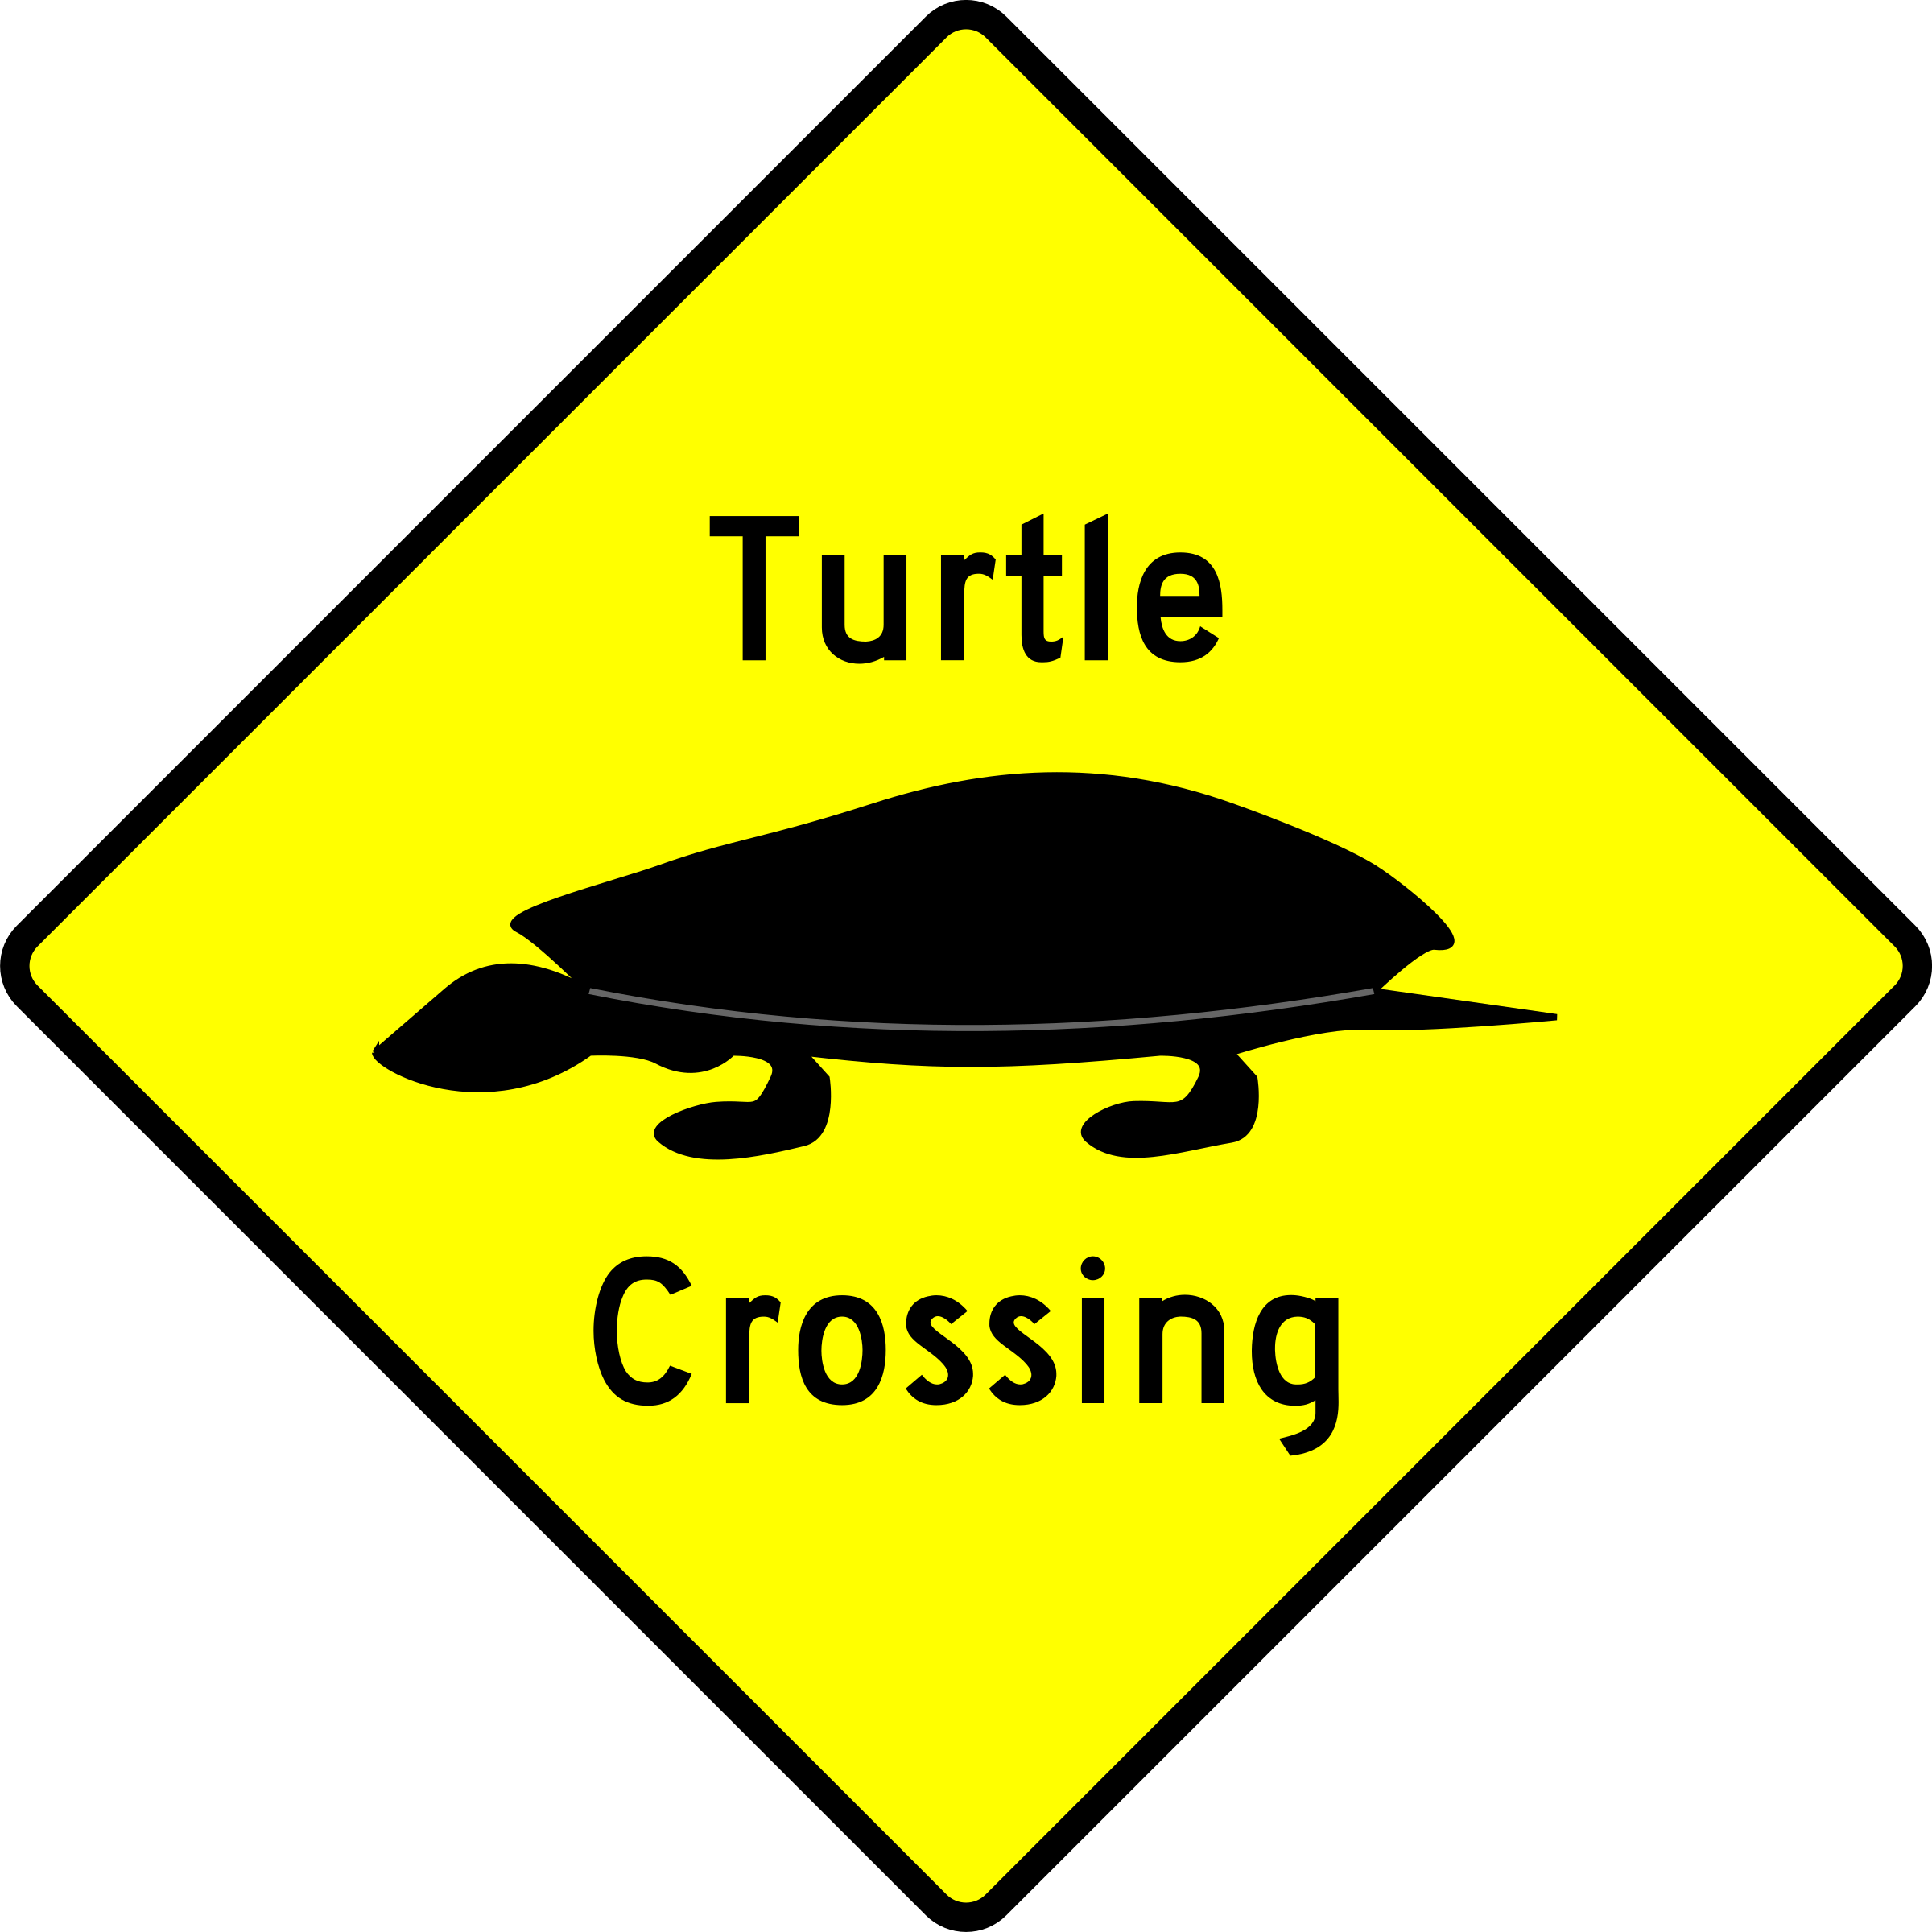 Caution Caution - turtle crossing